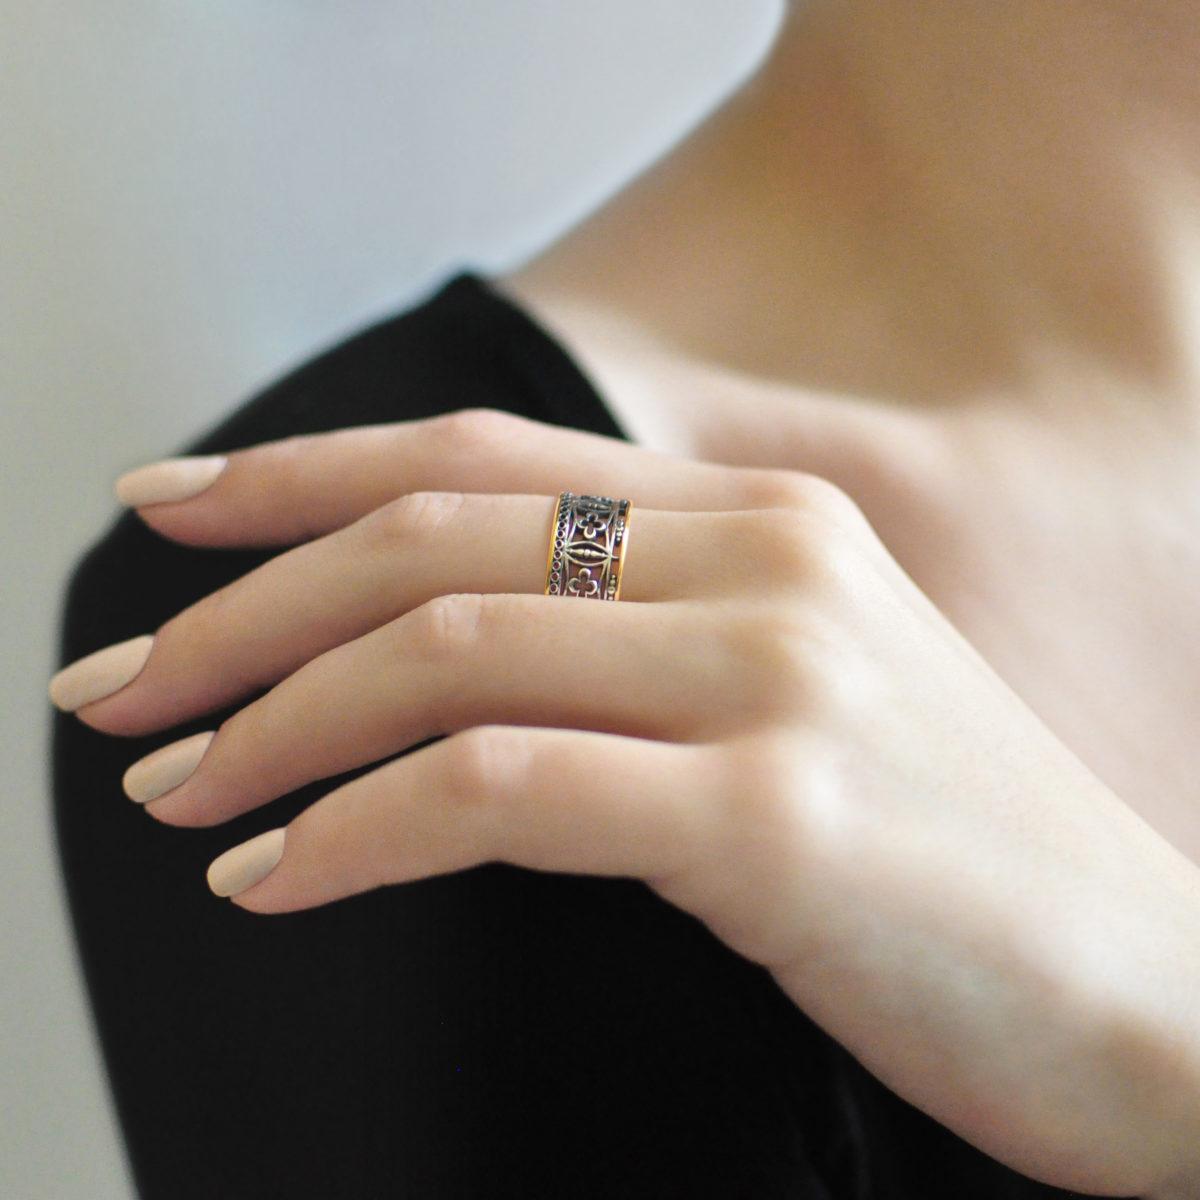 Zolochenie 5 1200x1200 - Кольцо из серебра «Петербург. Набережная Мойки» (золочение)